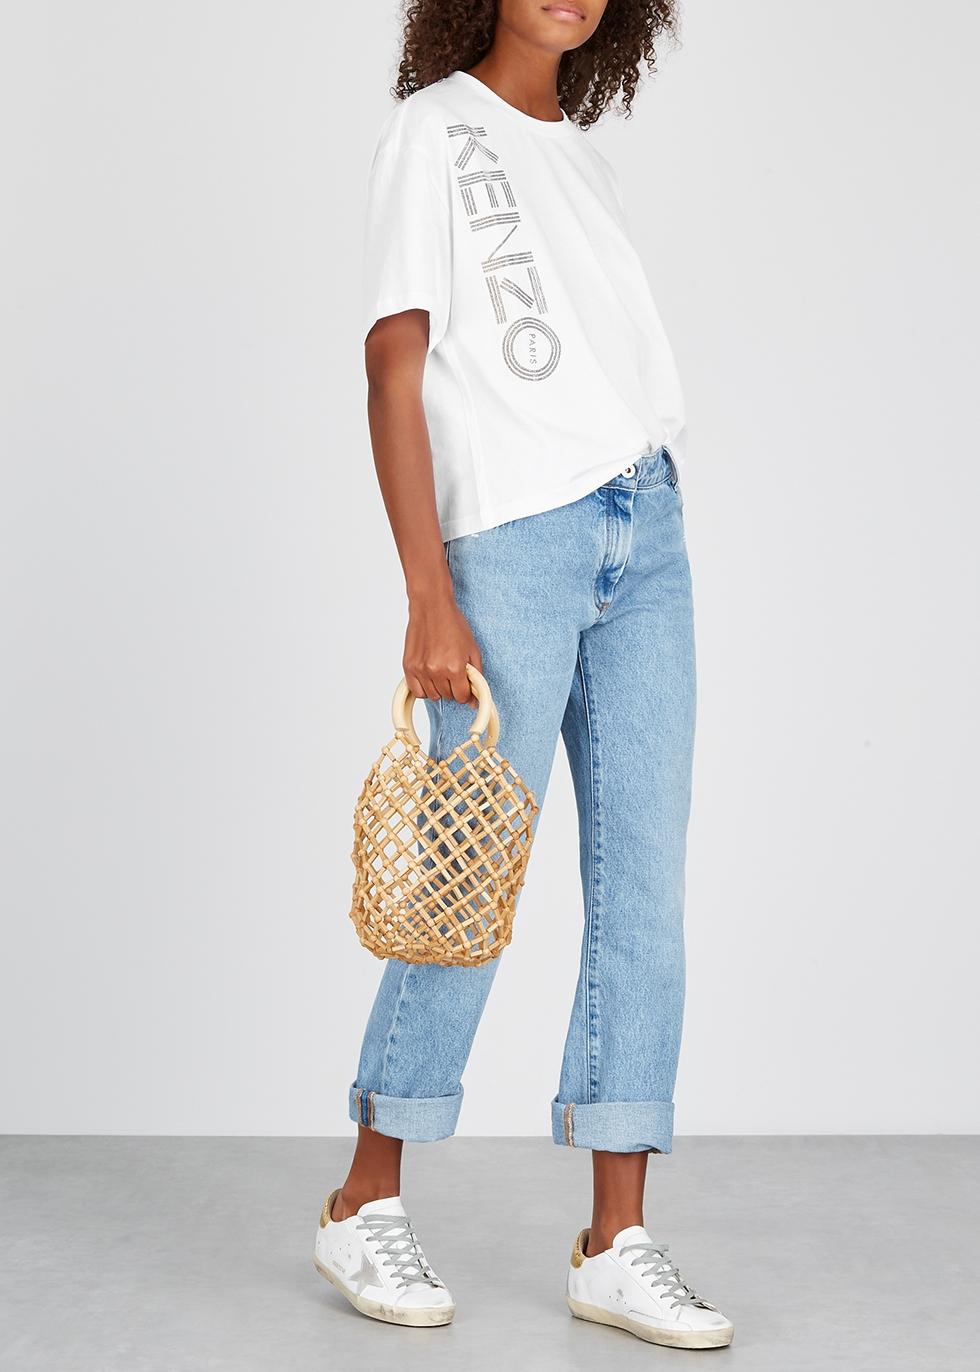 2e7169a59 Kenzo - Designer Sweatshirts, T-Shirts, Bags - Harvey Nichols